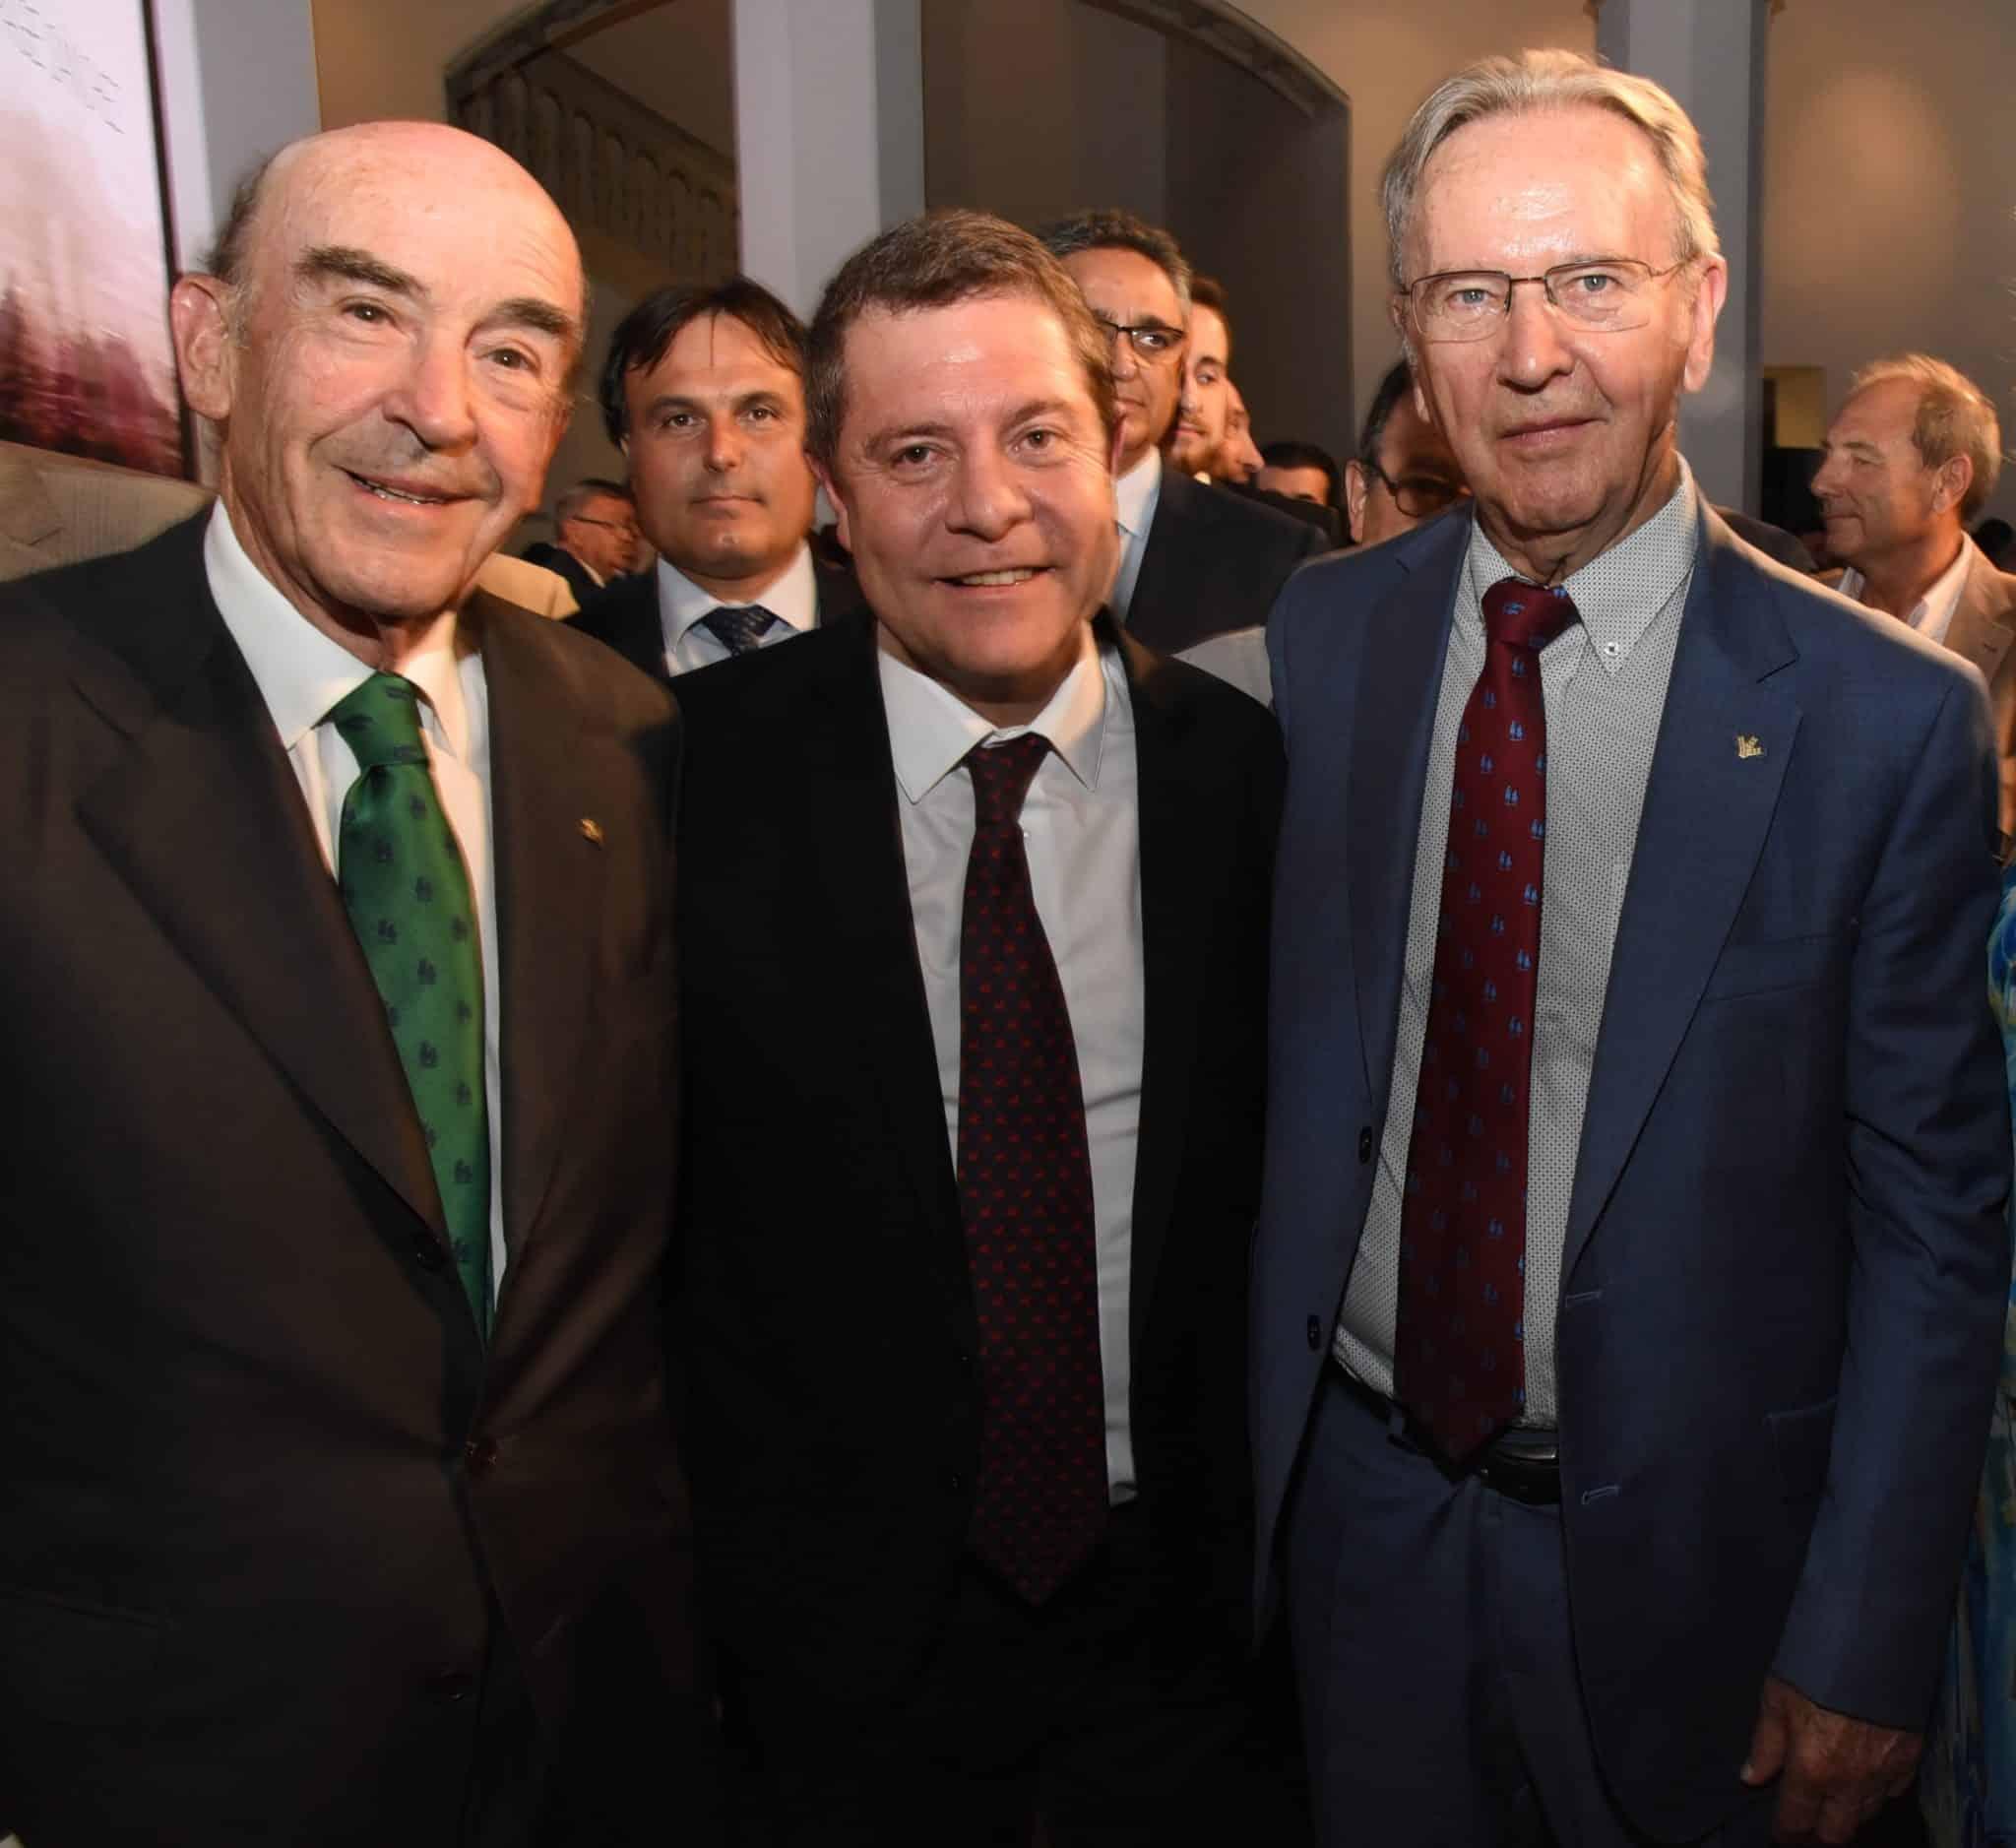 https://blog.globalcaja.es/wp-content/uploads/2019/07/Toma-posesion-Garcia-Page.jpg